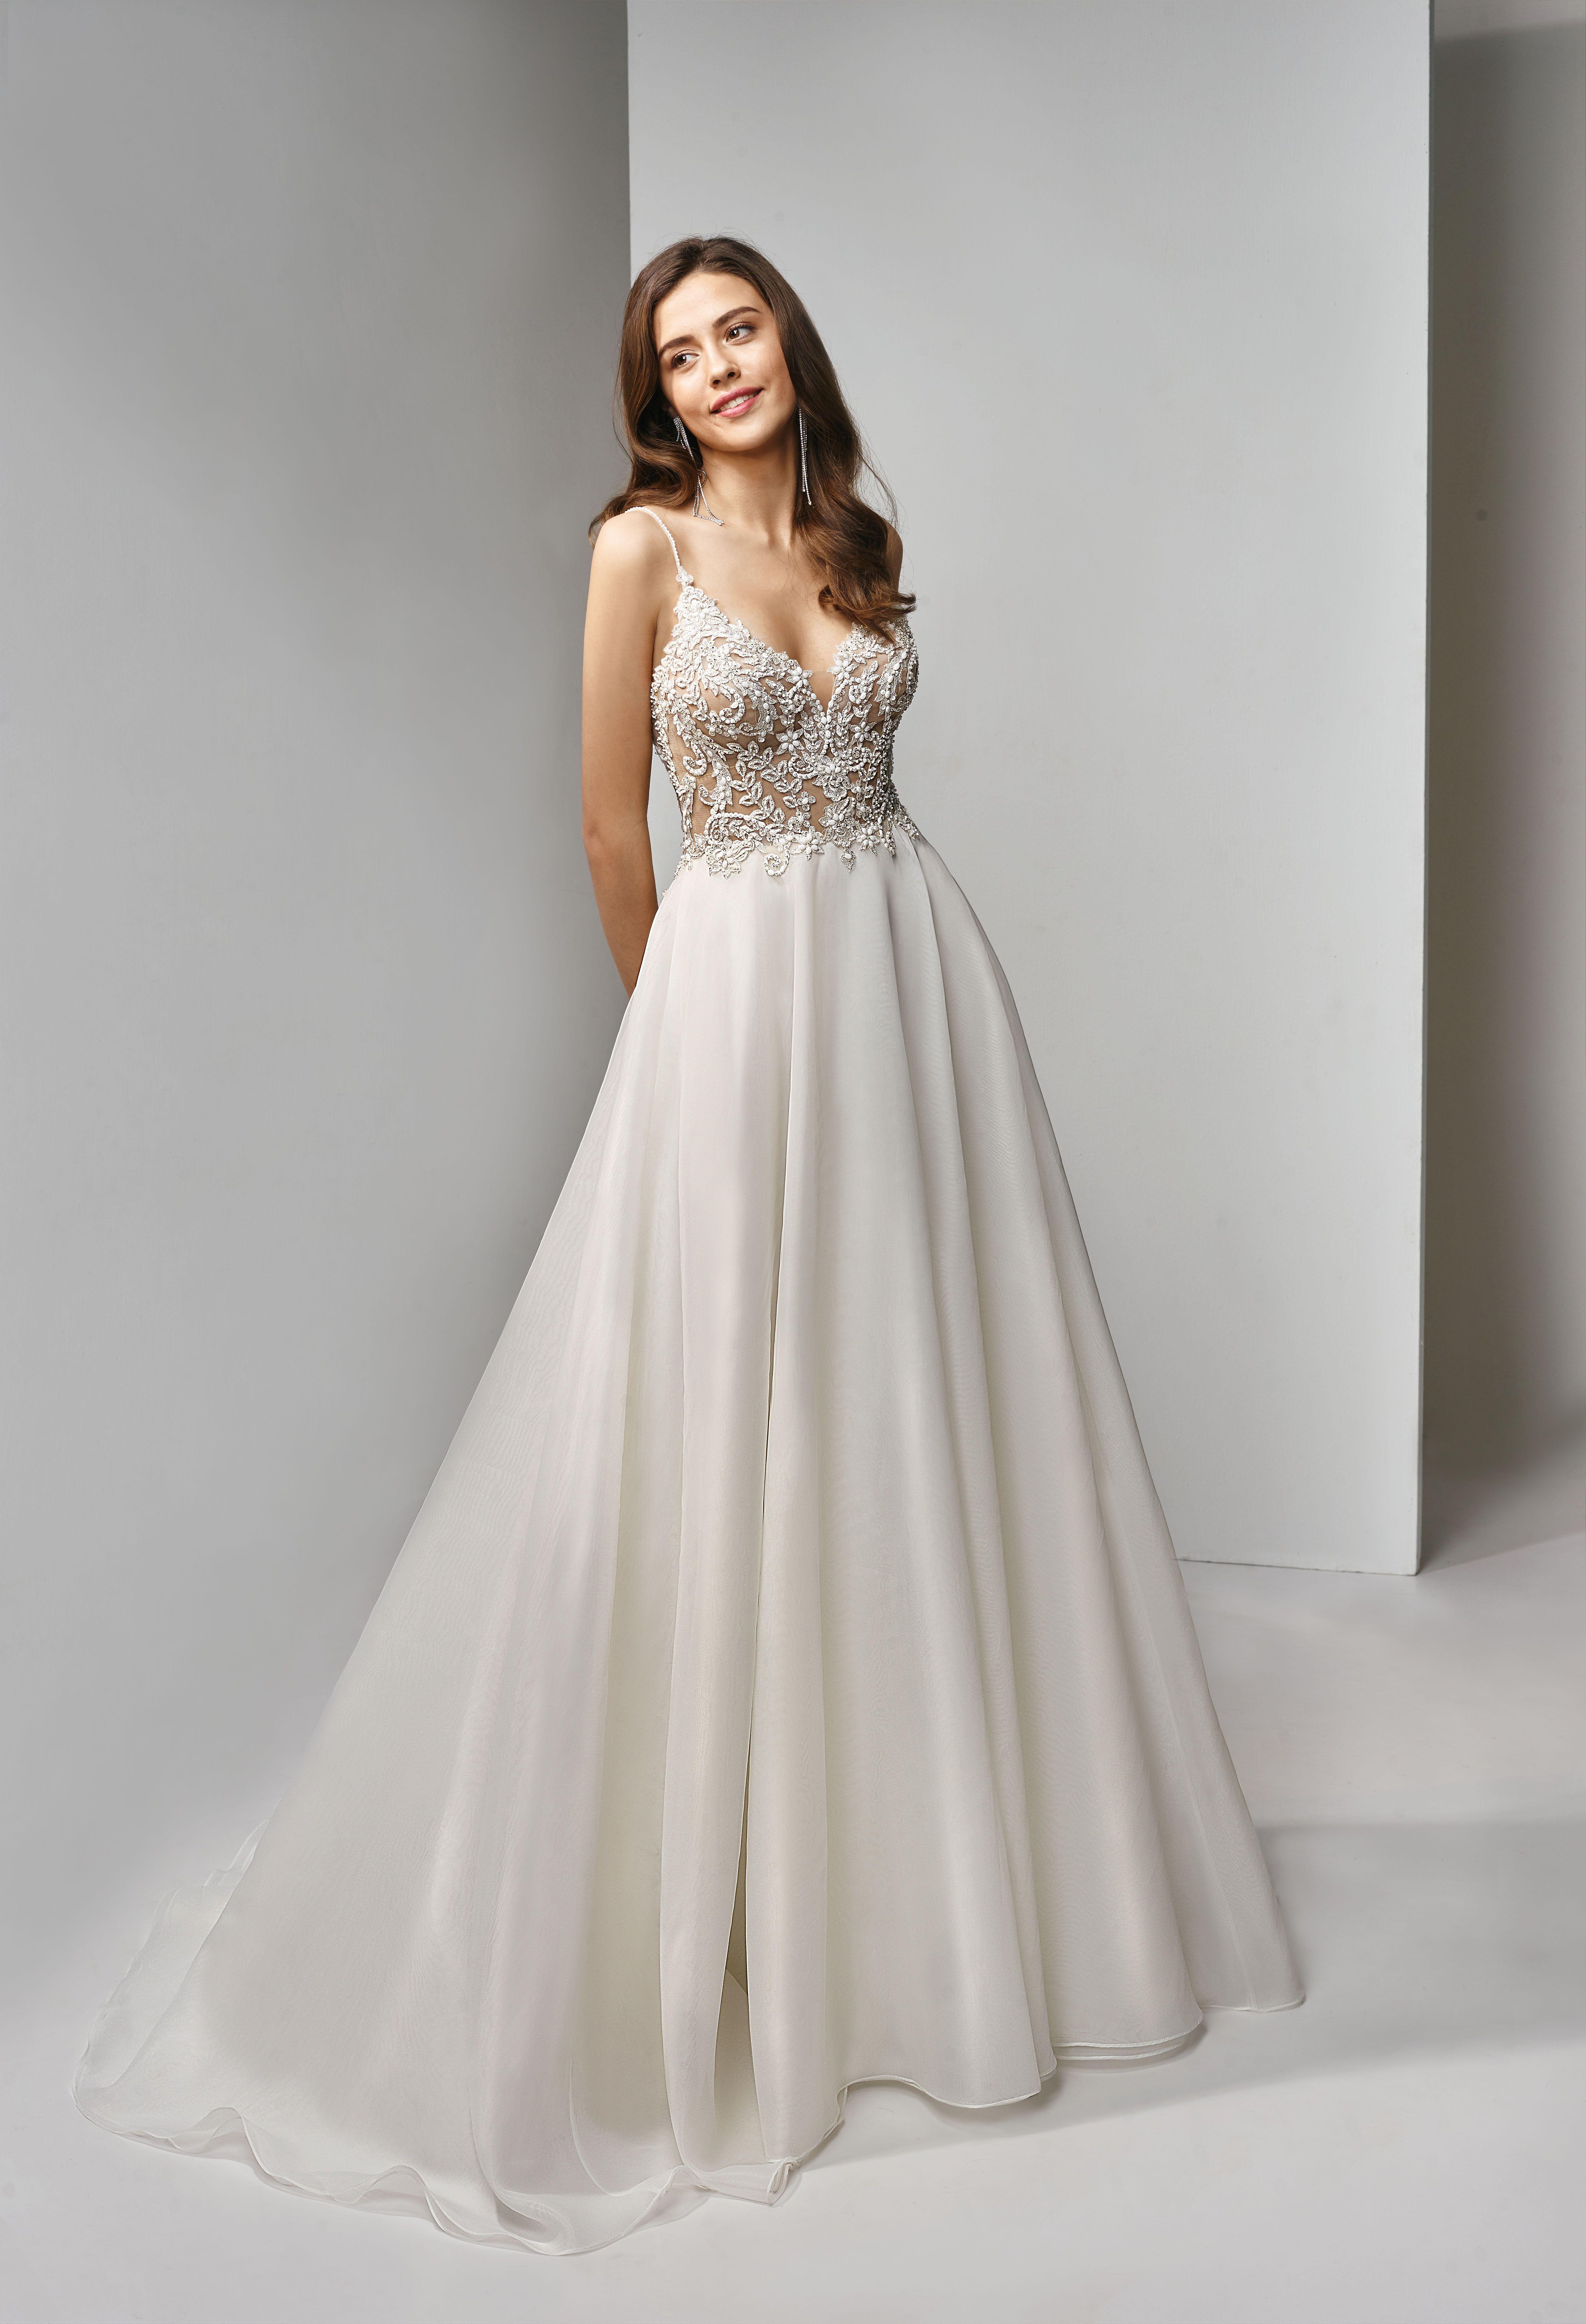 Bt191 a fulllength aline gown with an